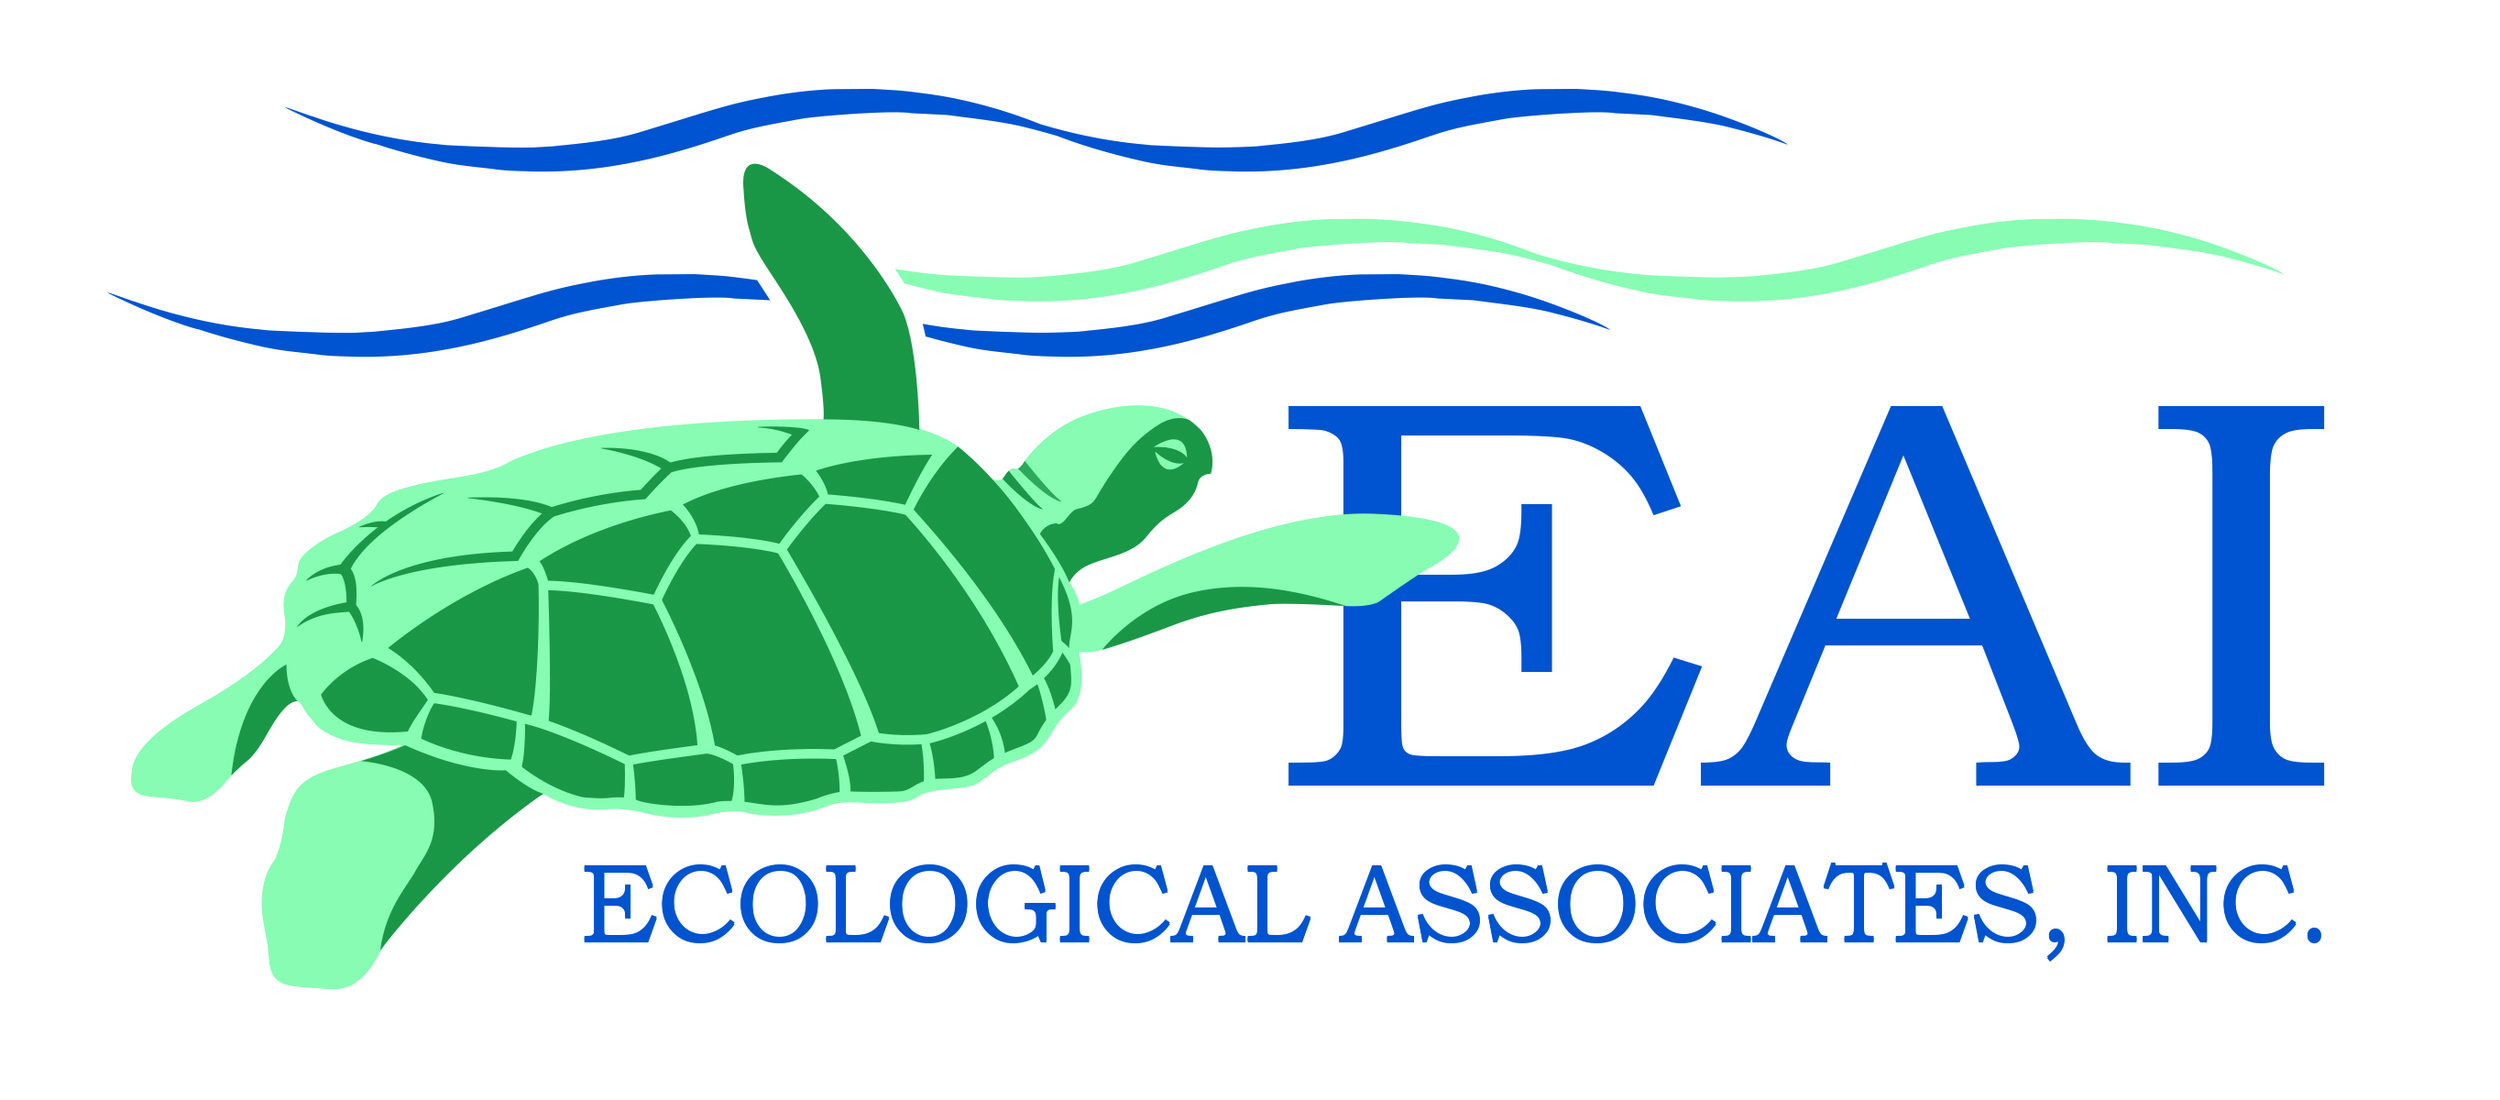 EAI logo.jpg